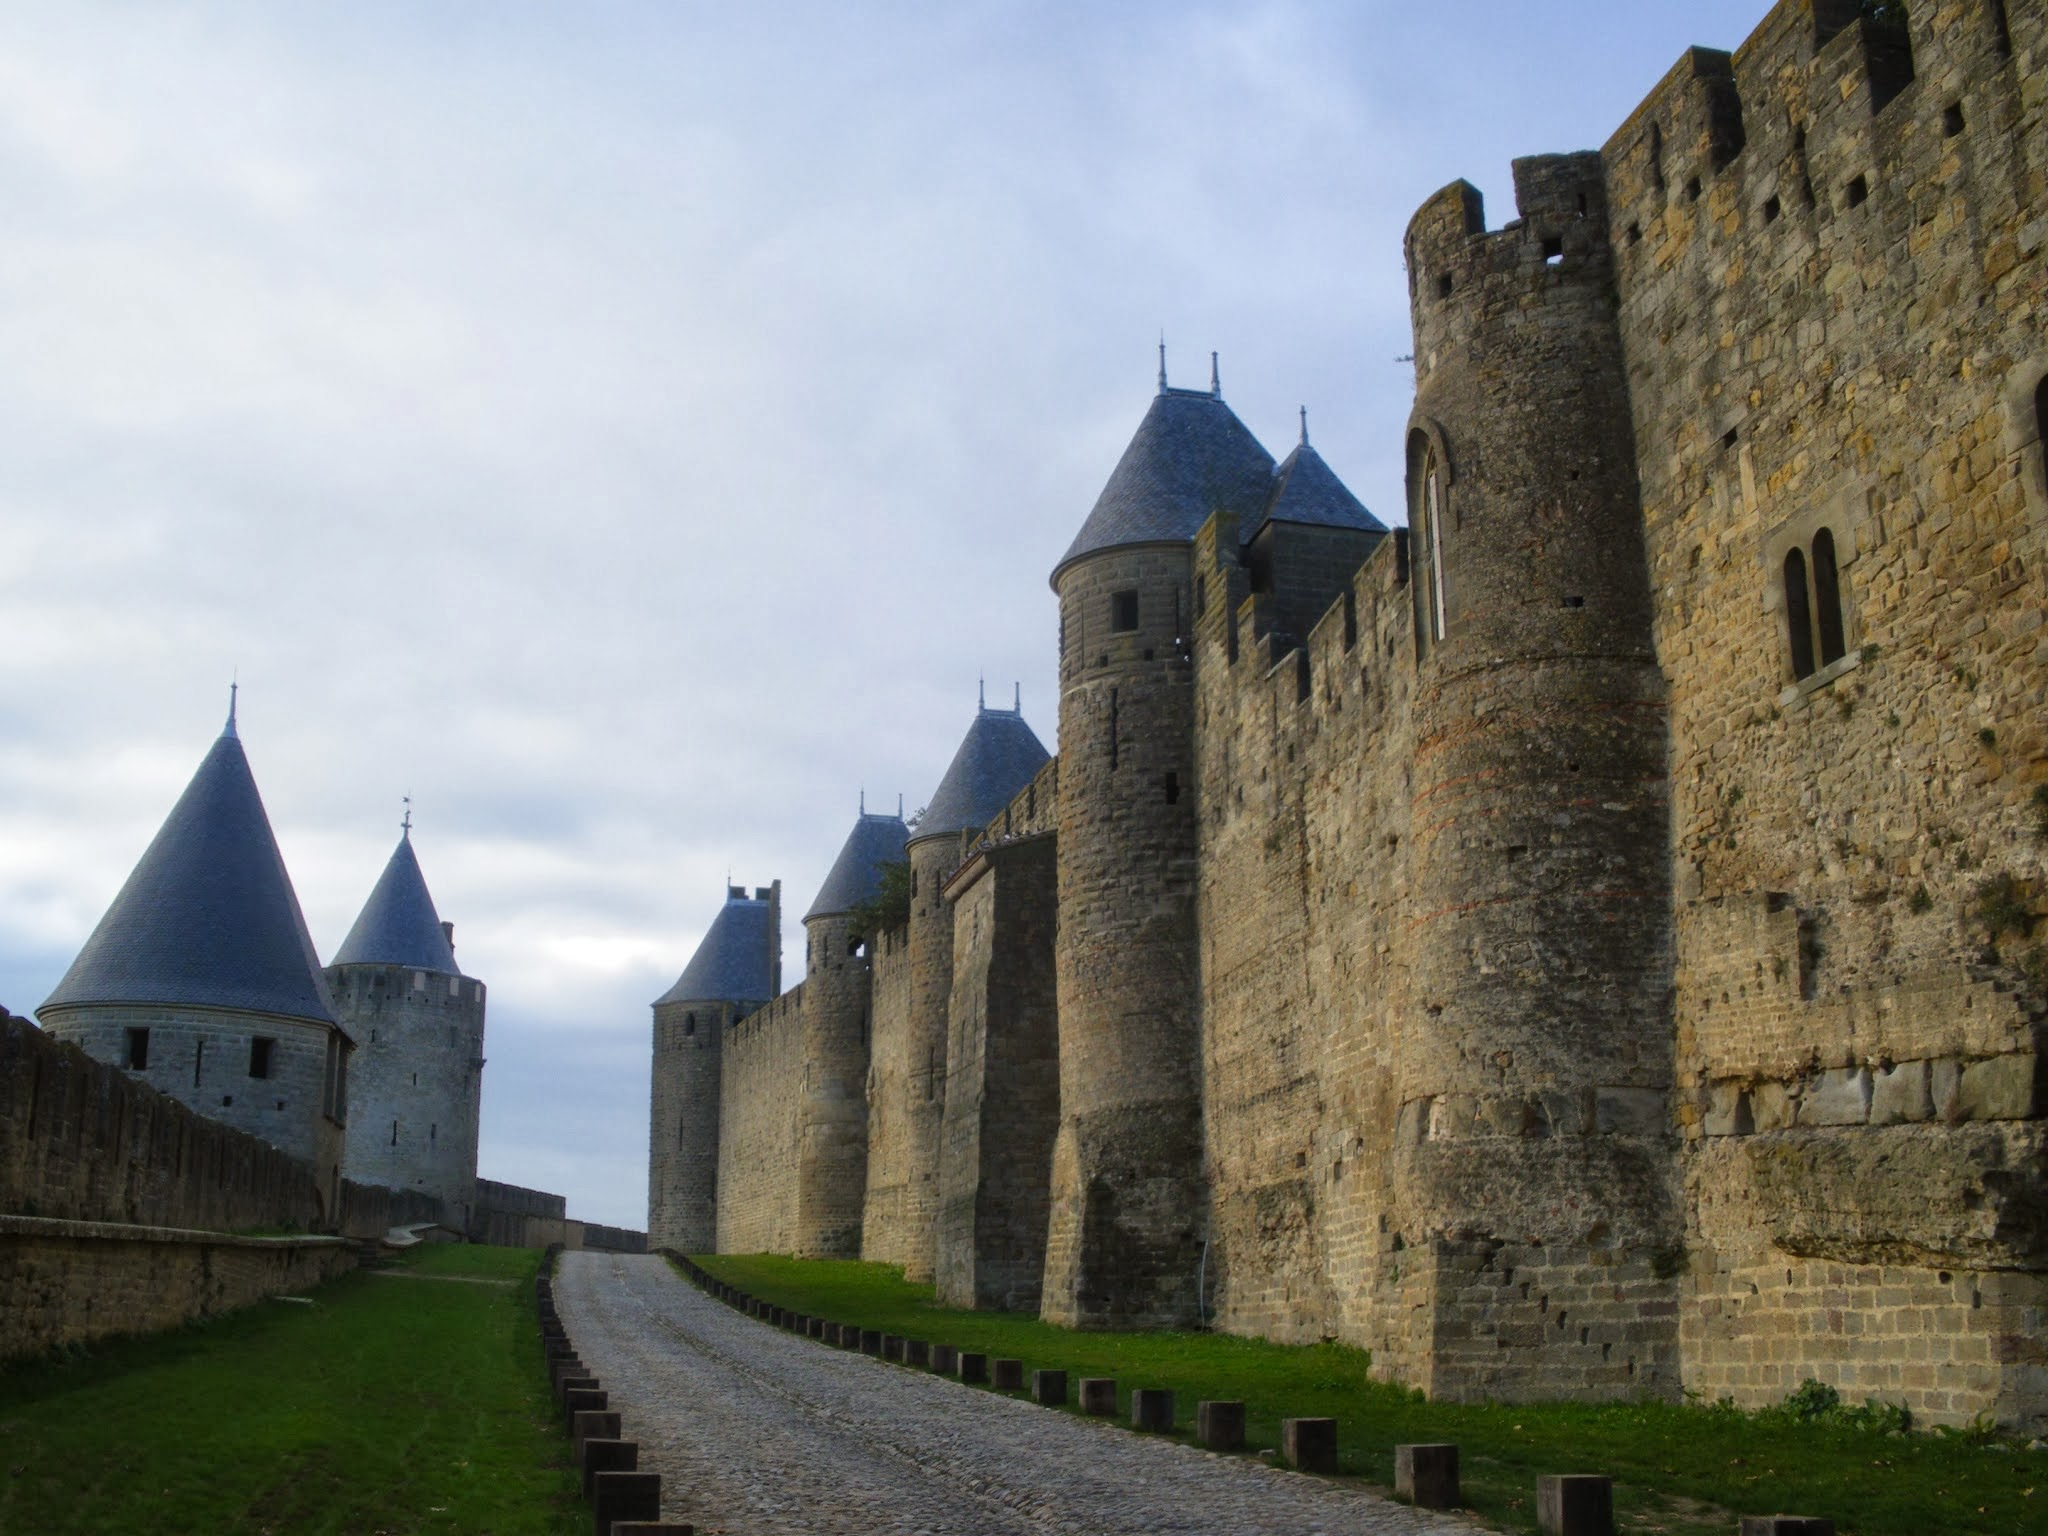 Muralles de Carcassona Carcassonne Cite Aude Pays Cathare